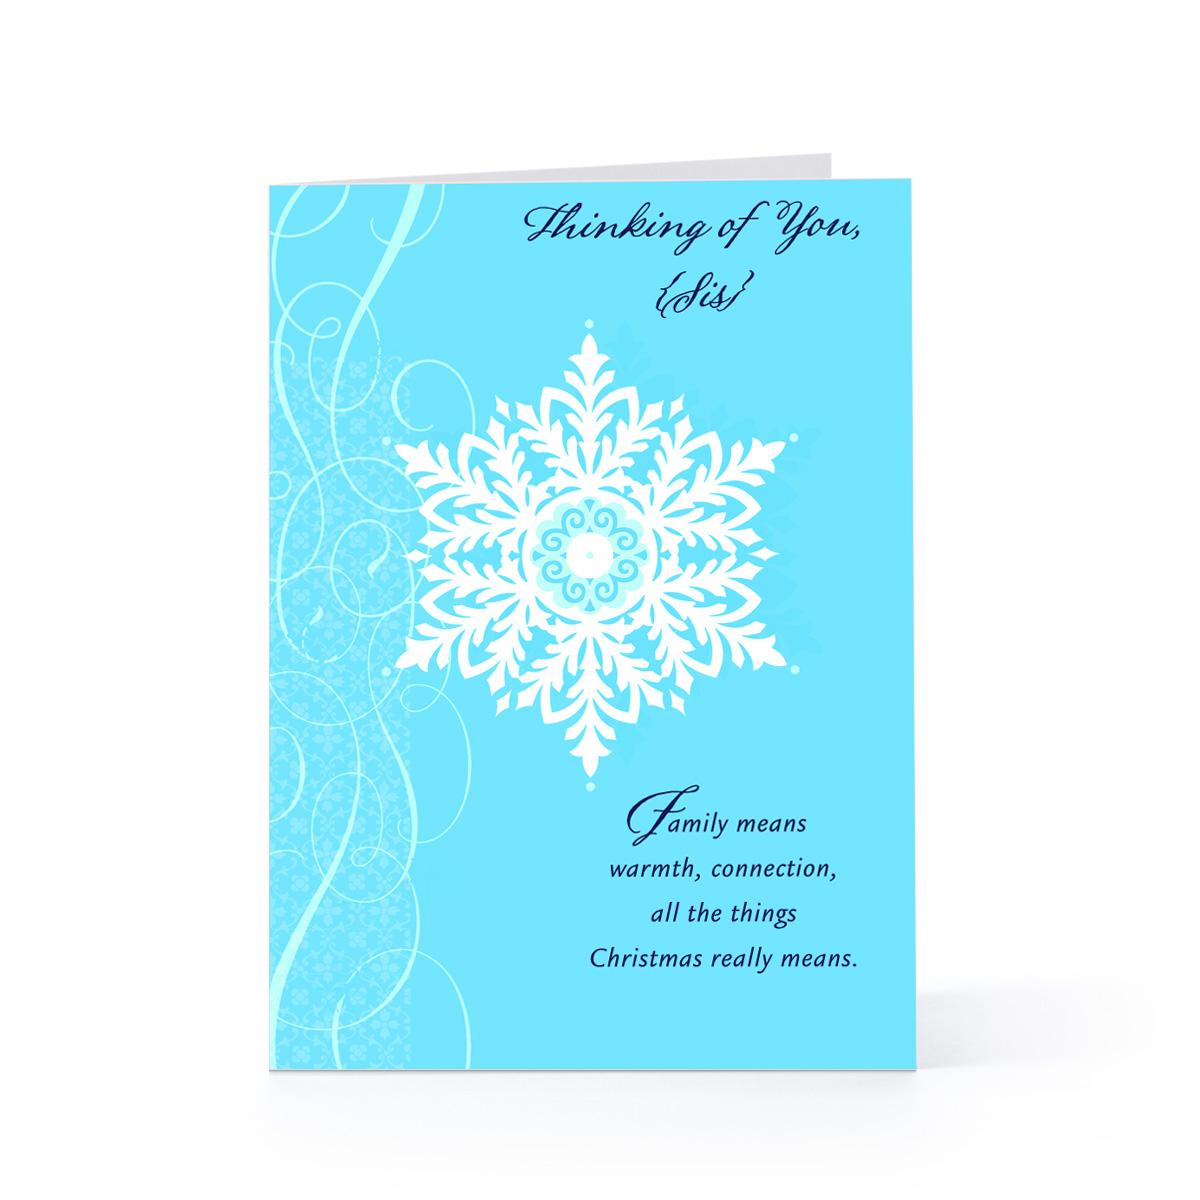 hallmark christmas card quotes quotesgram